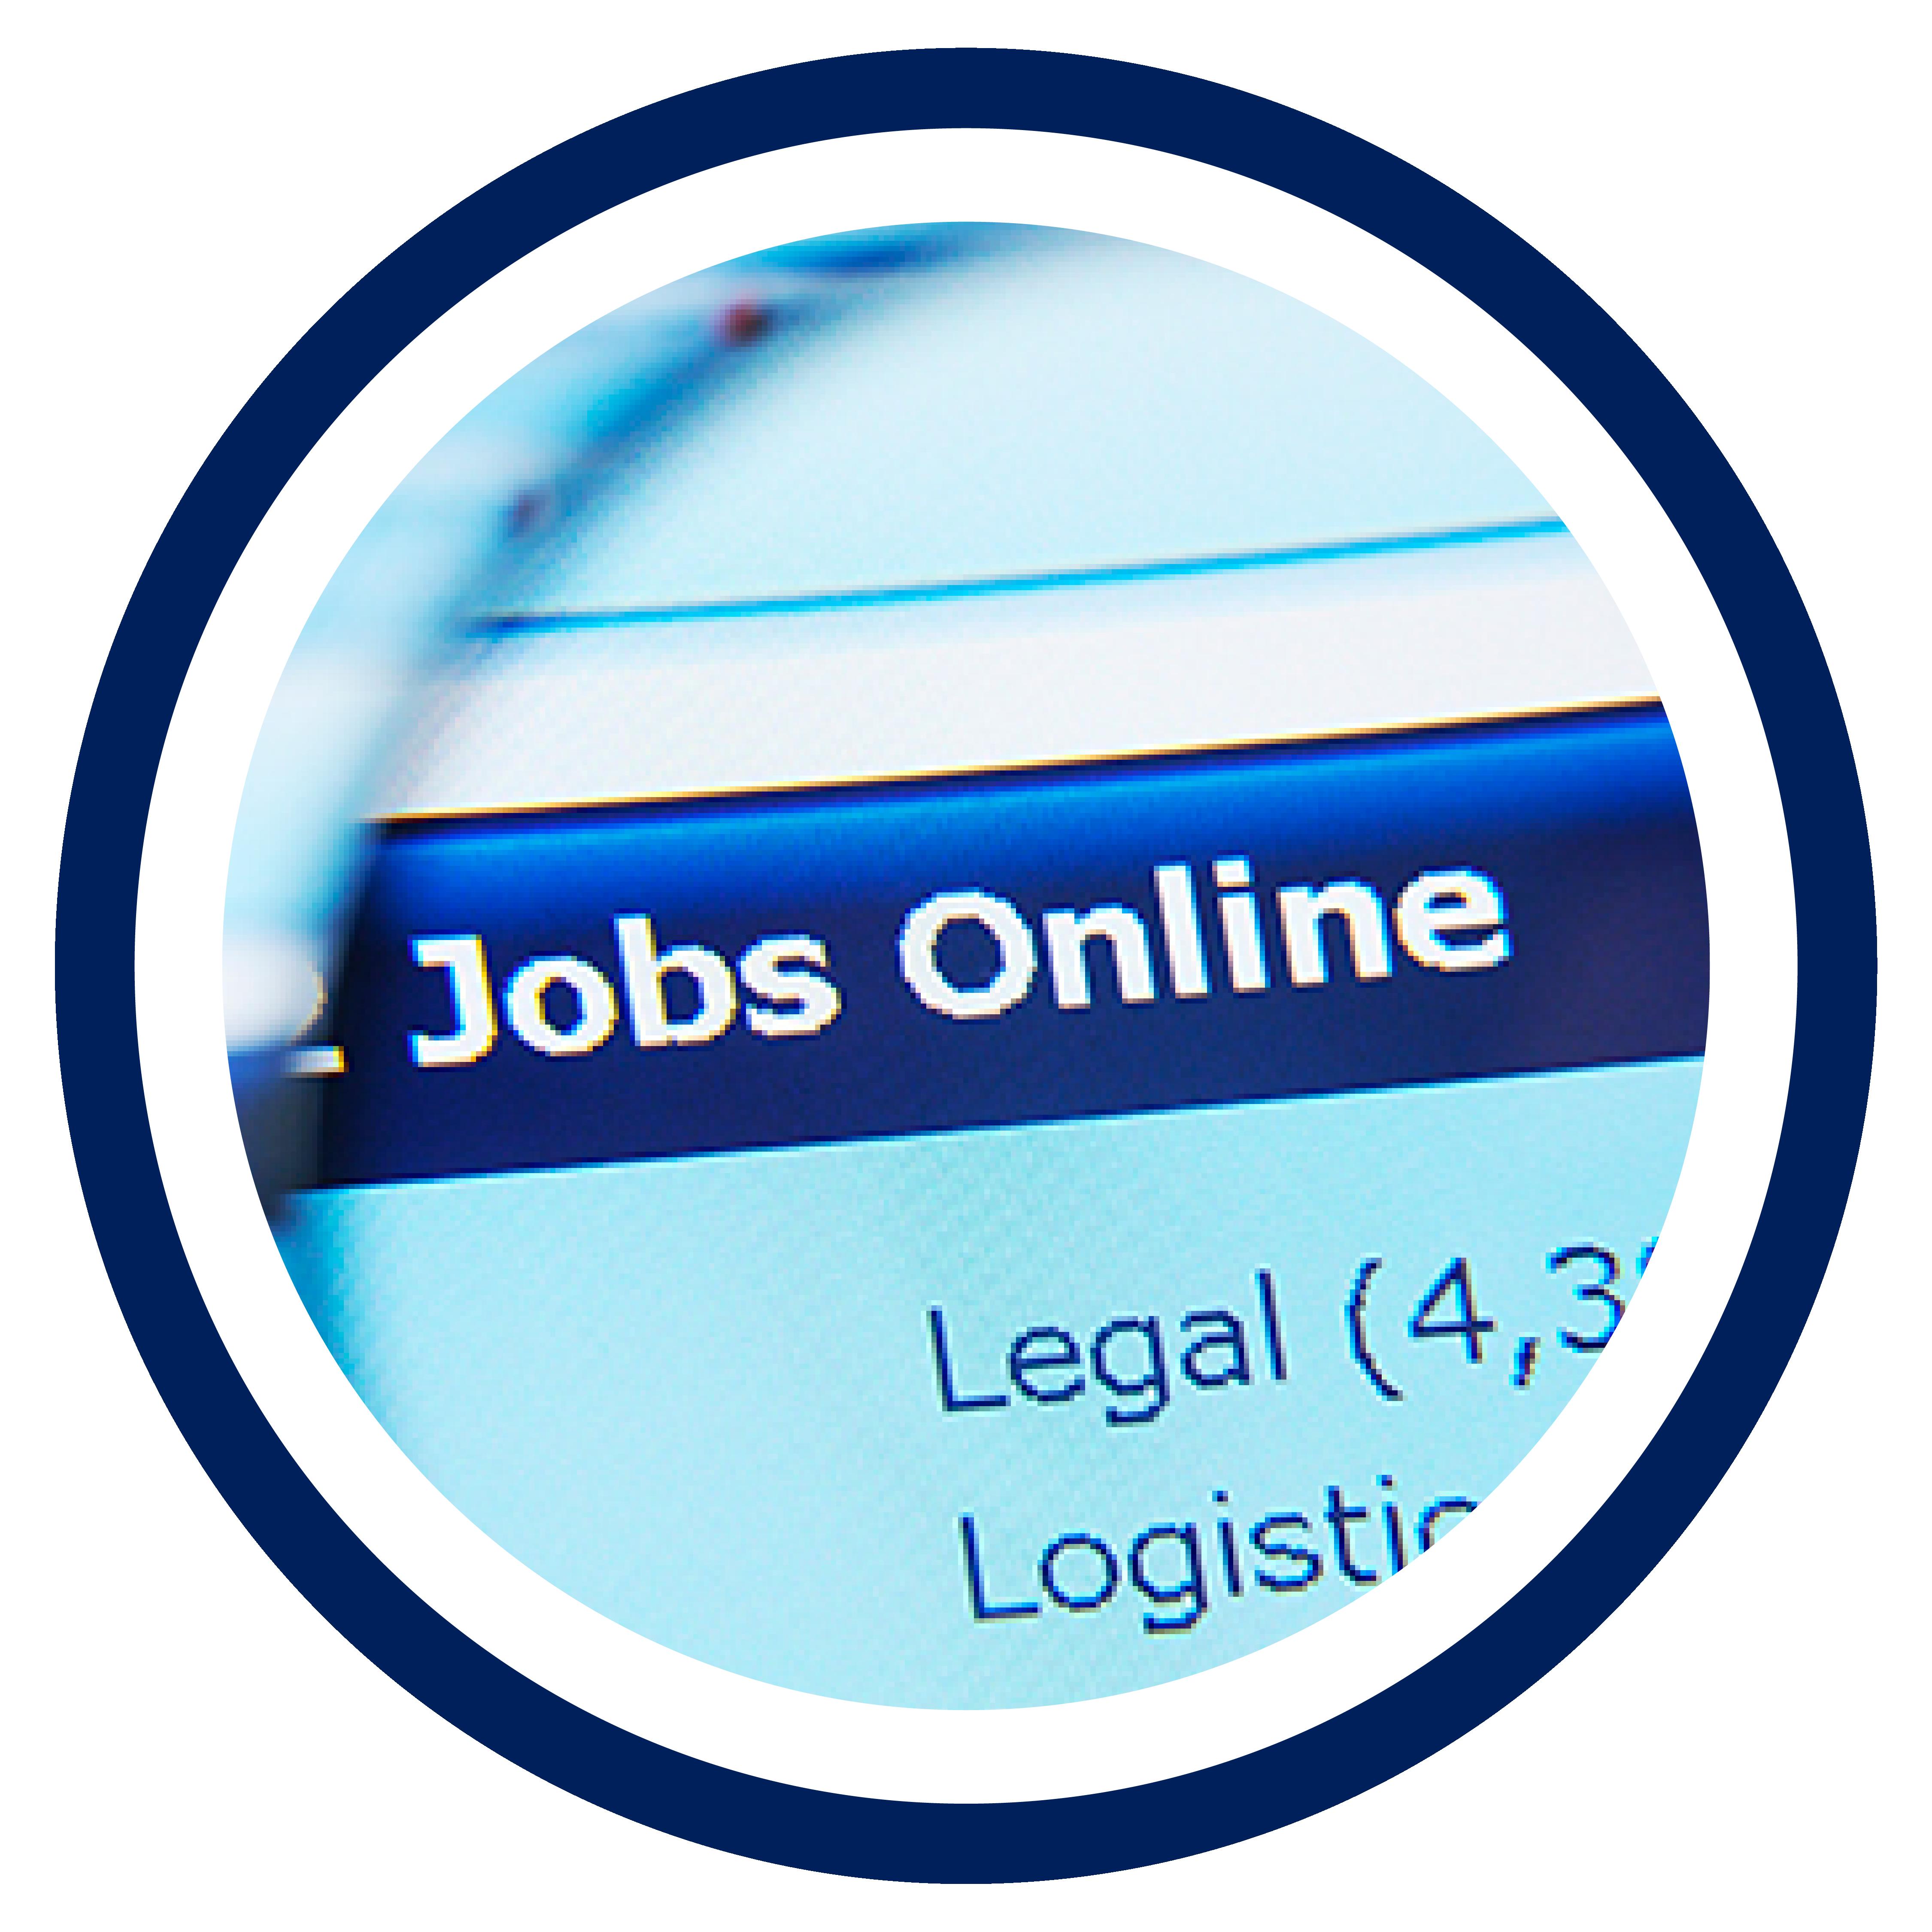 Image of job board on website